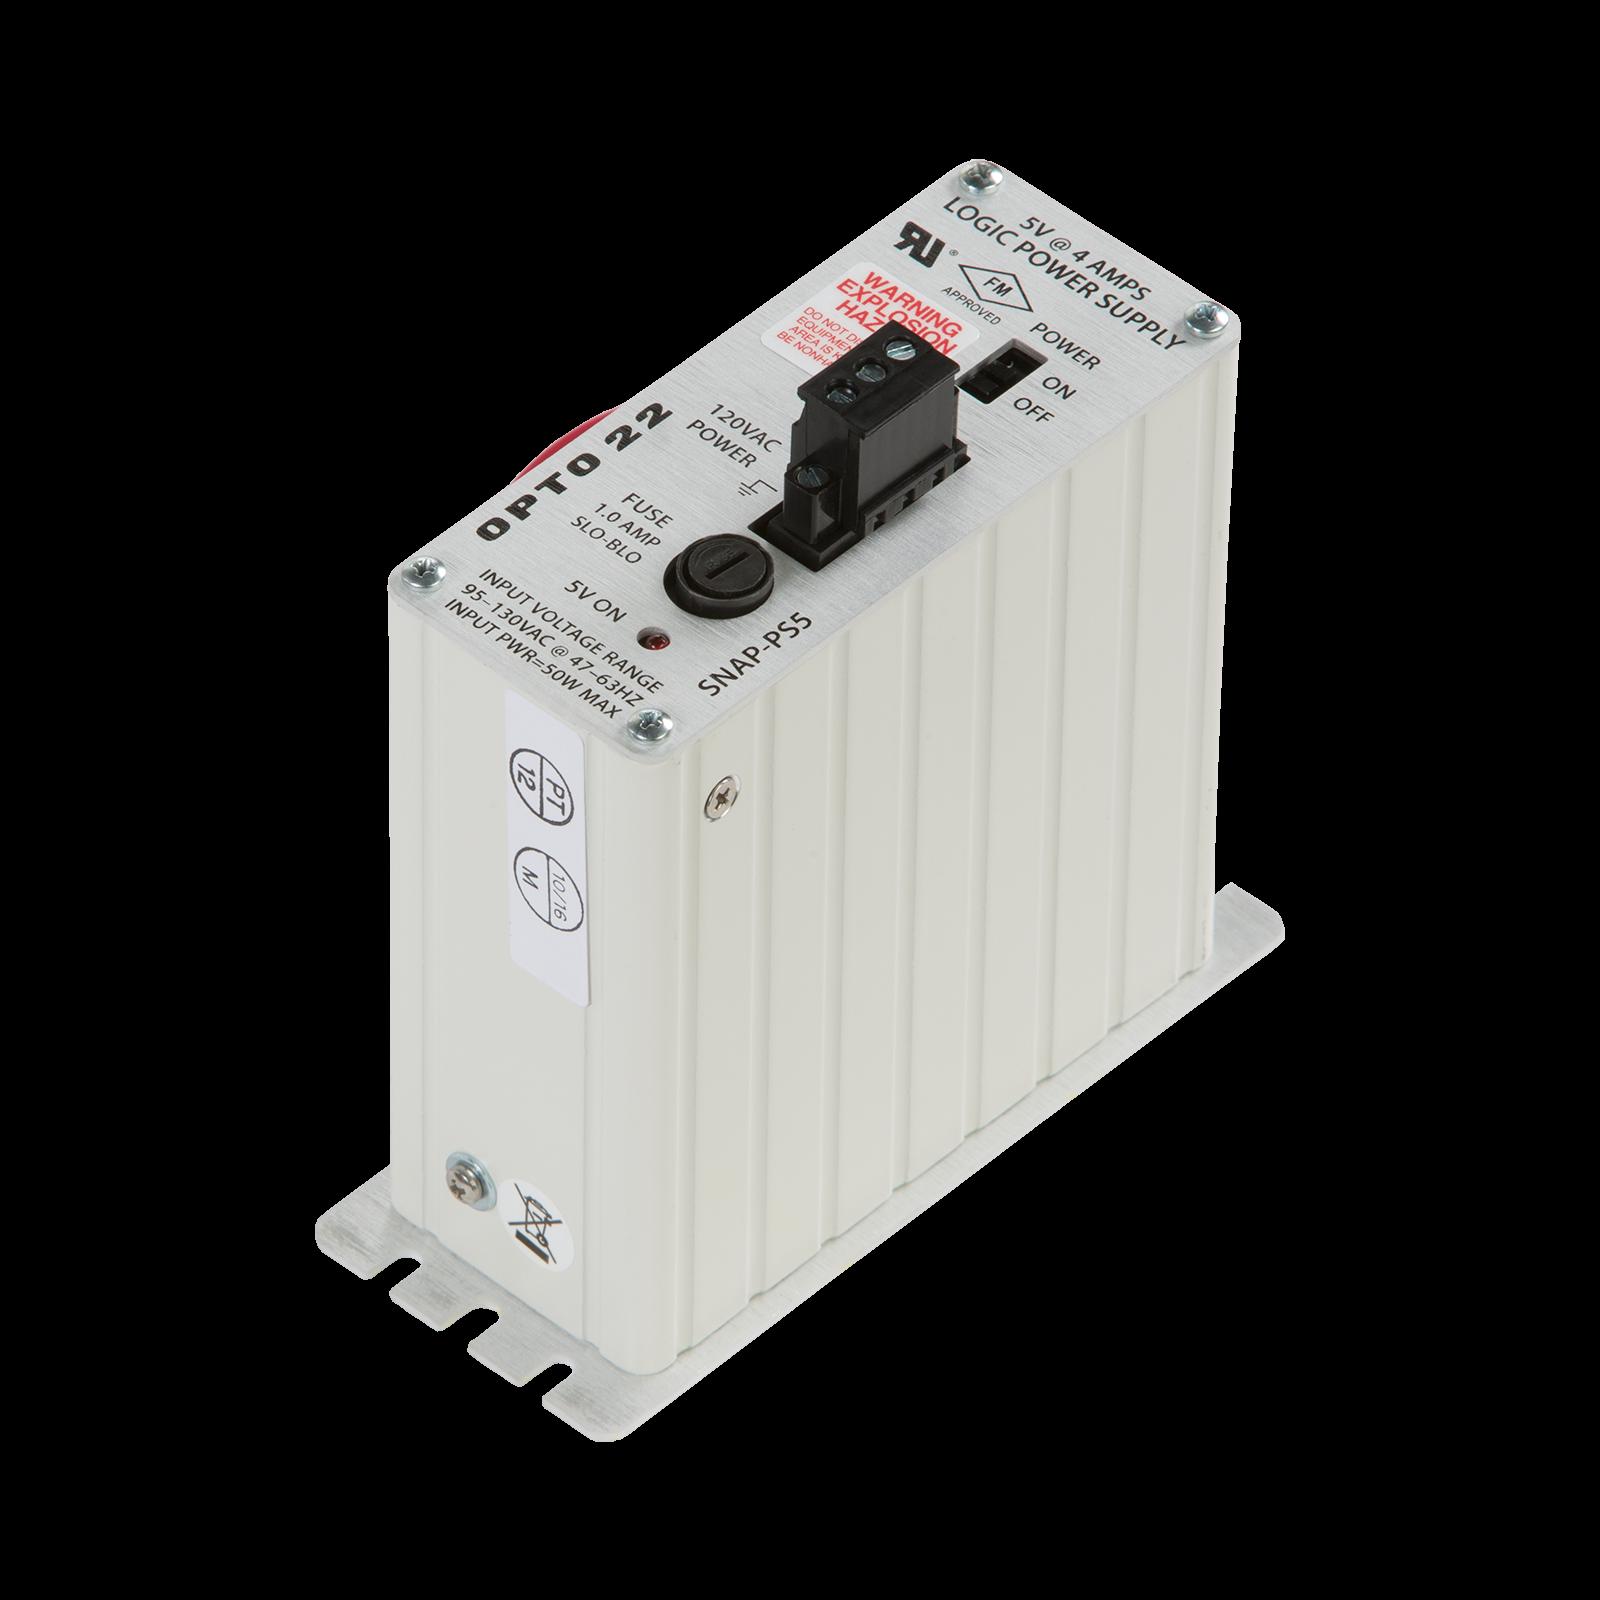 24 VDC 10 Amp Power Supply 100-230 Vac Input 47-63hz